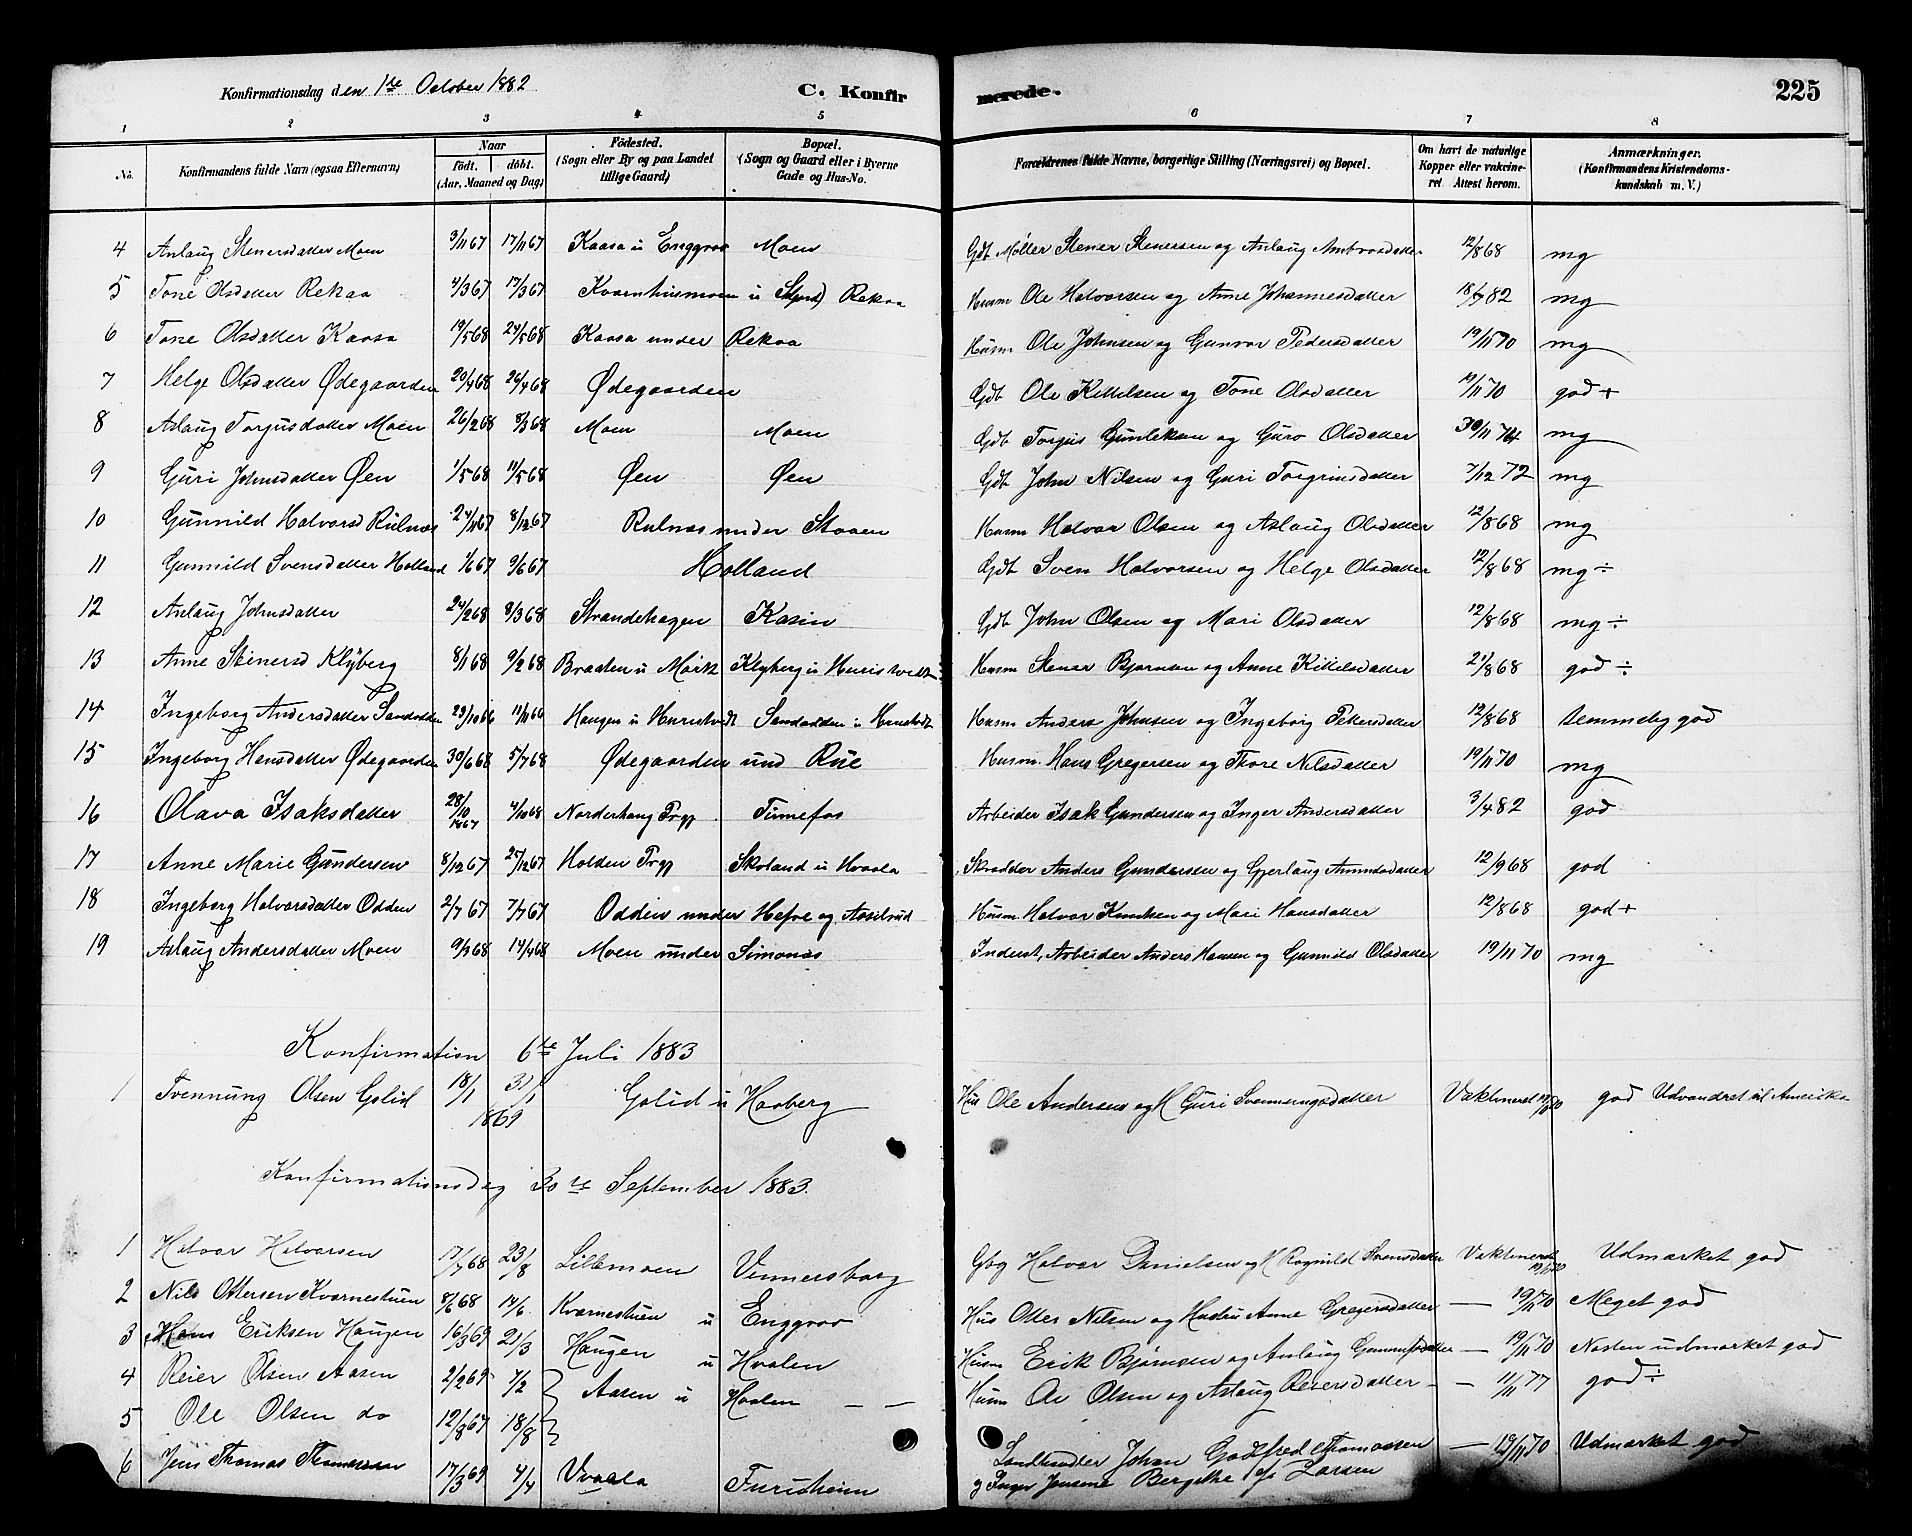 SAKO, Heddal kirkebøker, G/Ga/L0002: Klokkerbok nr. I 2, 1879-1908, s. 225